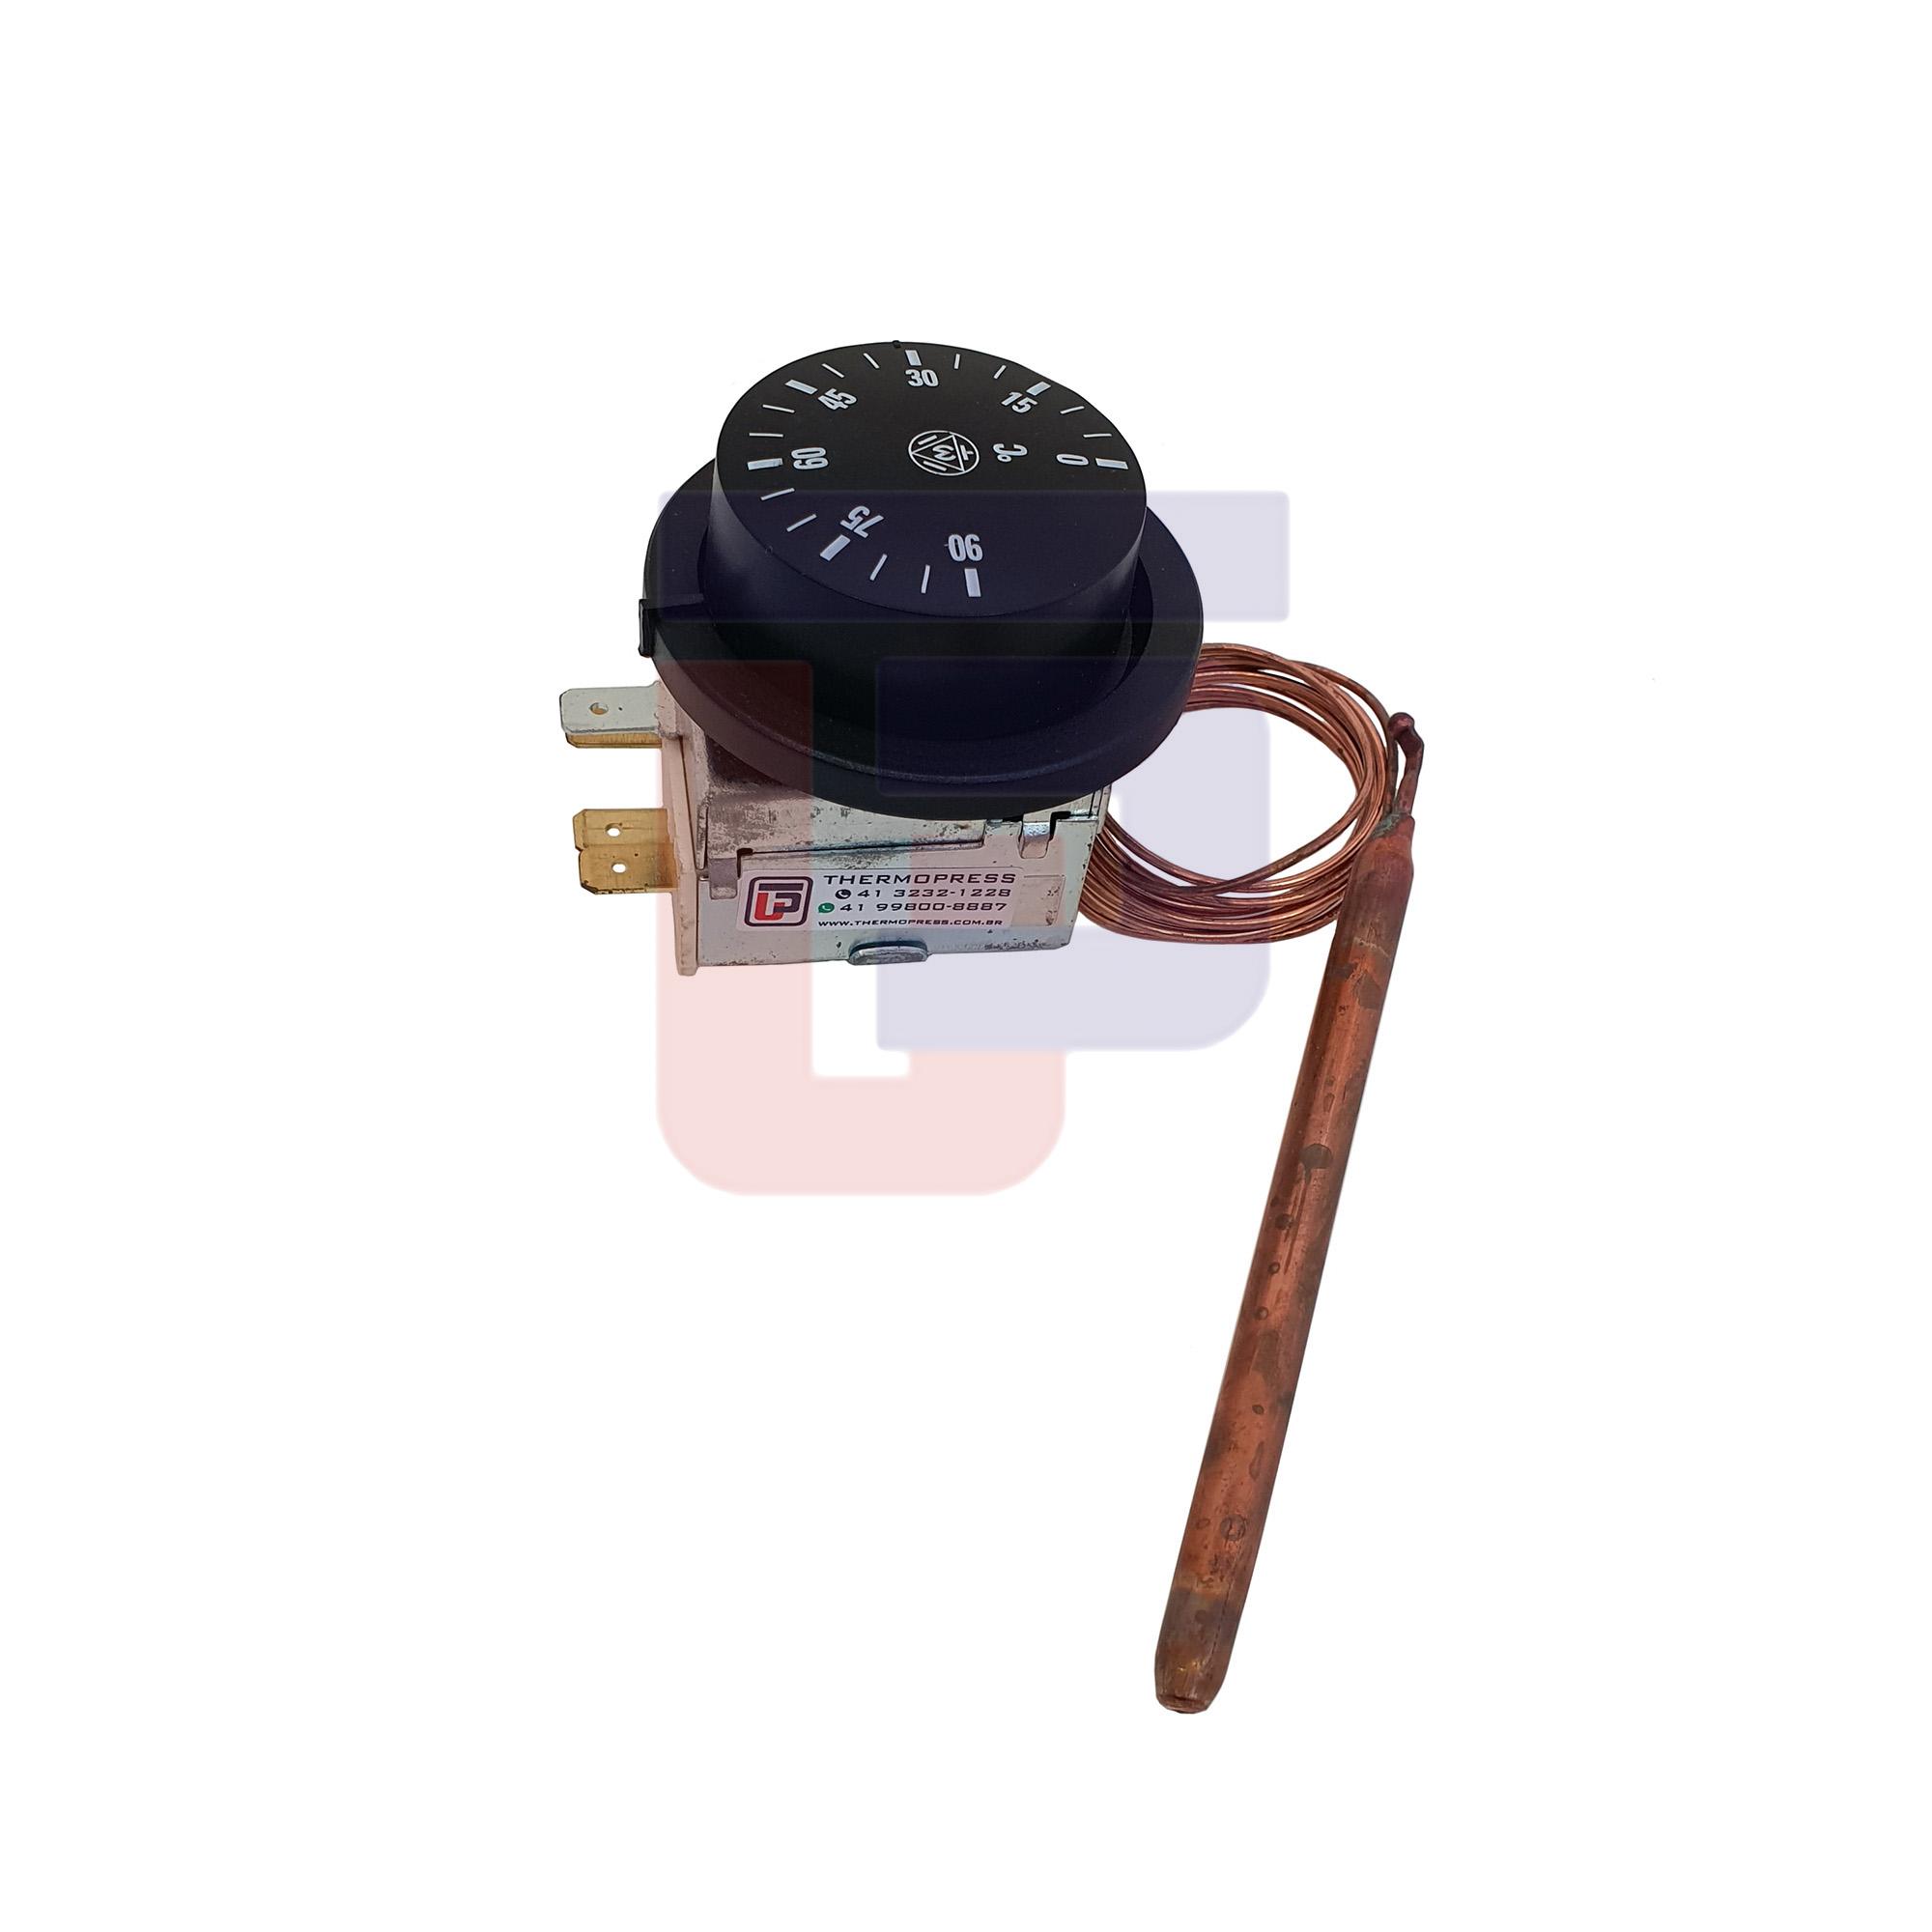 Termostato Imit 0-90°C, TR2 9325